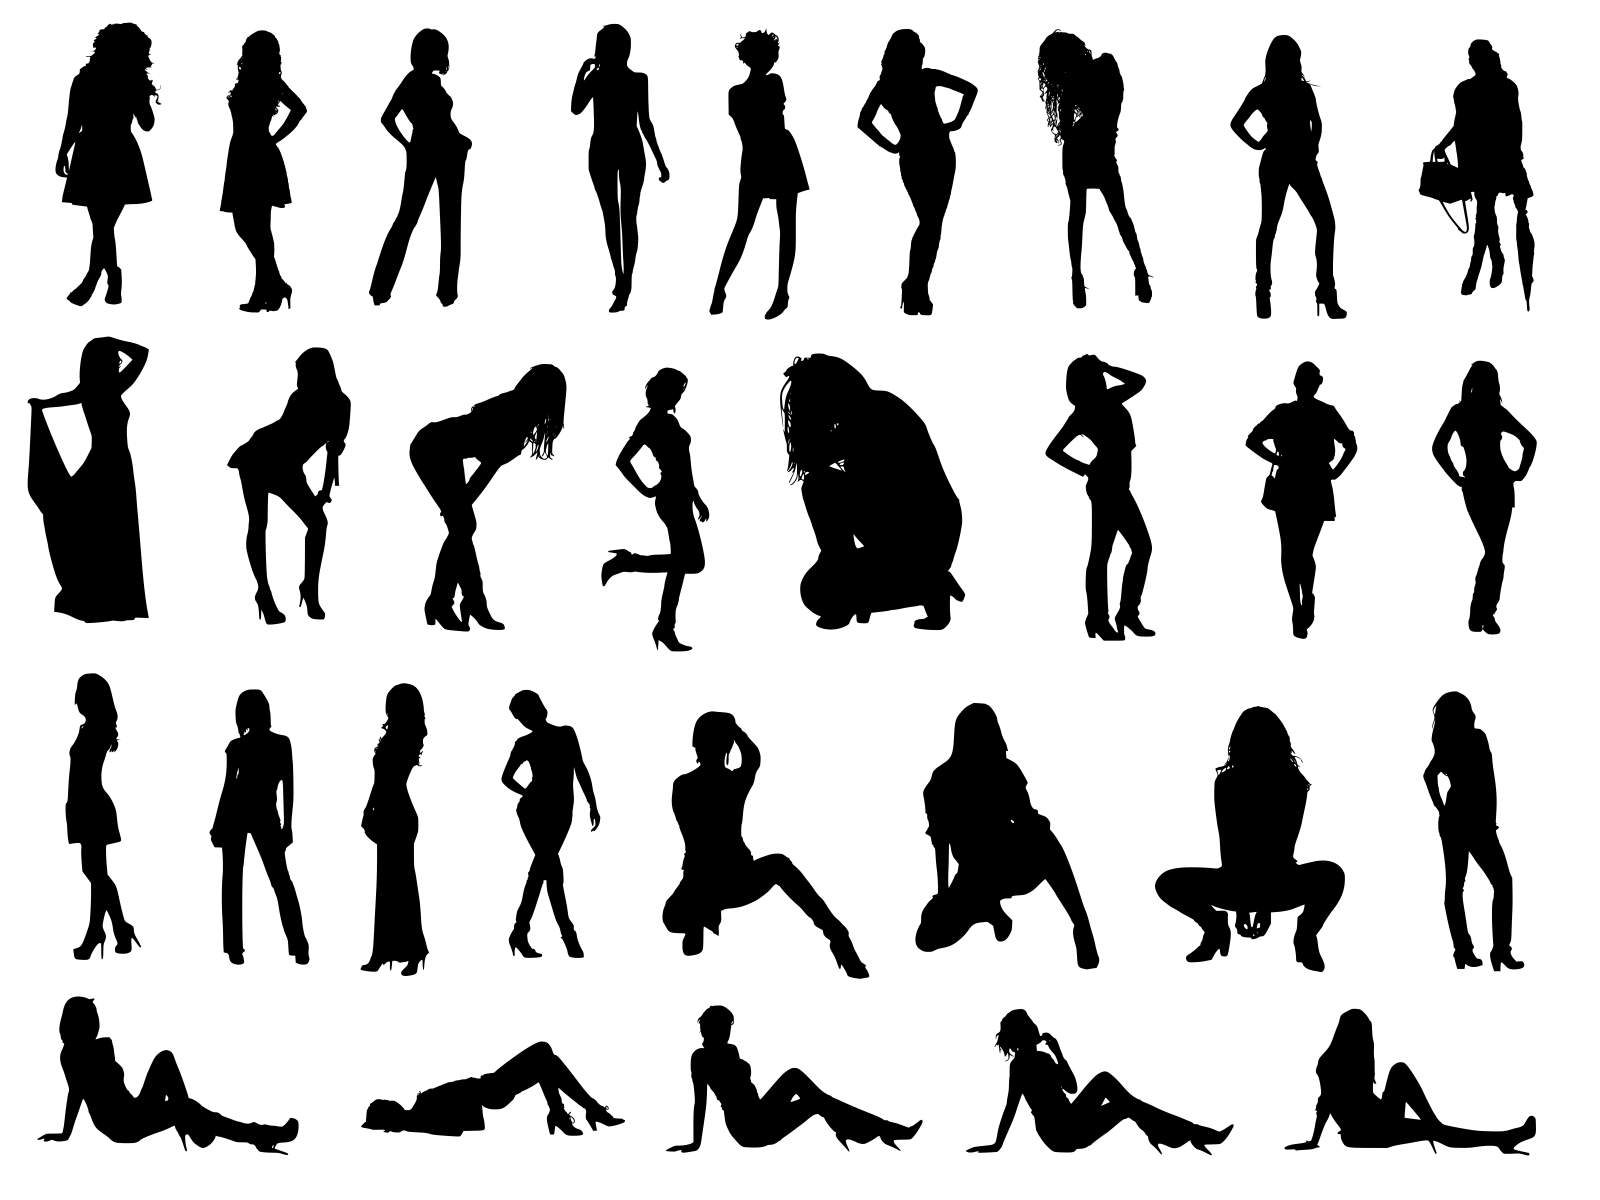 30 Woman Silhouettes Transparent